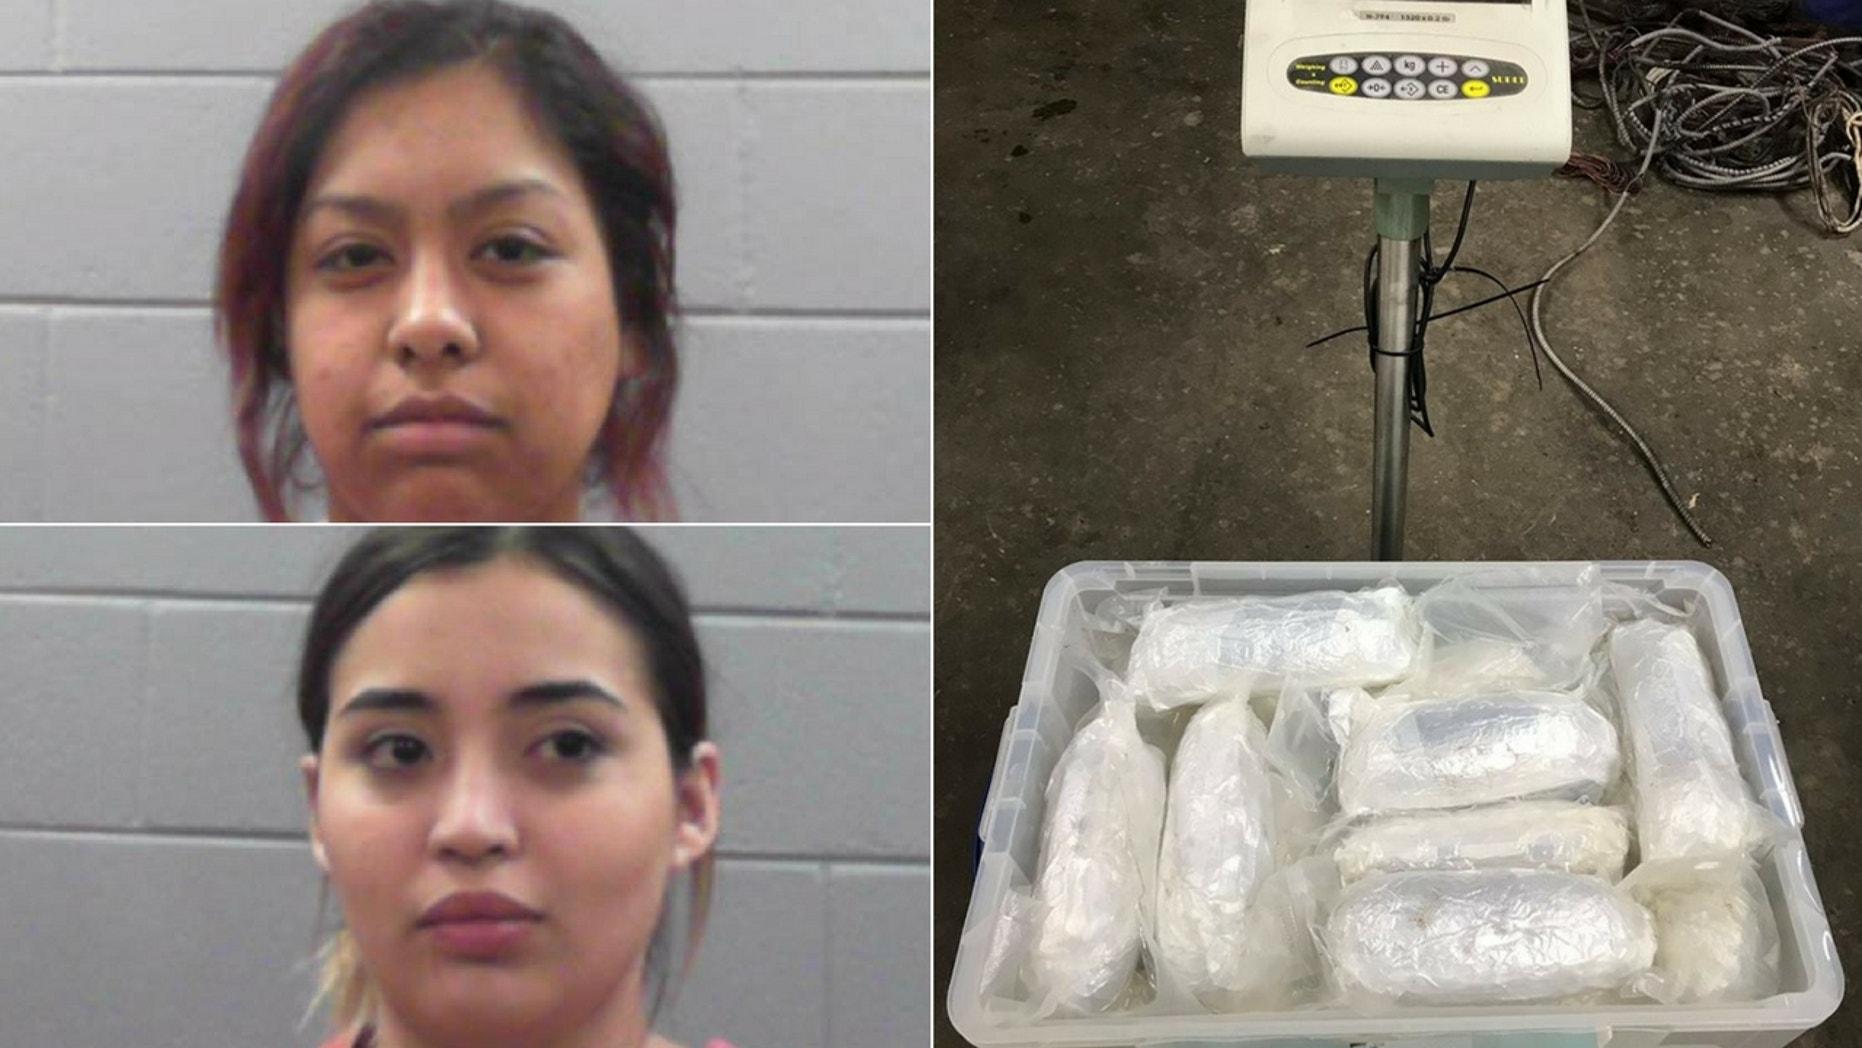 Trisha Lynne Ibarra (top) and Trisha Lynne Ibarra (bottom) were caught with $10 million worth of heroin inside their car.